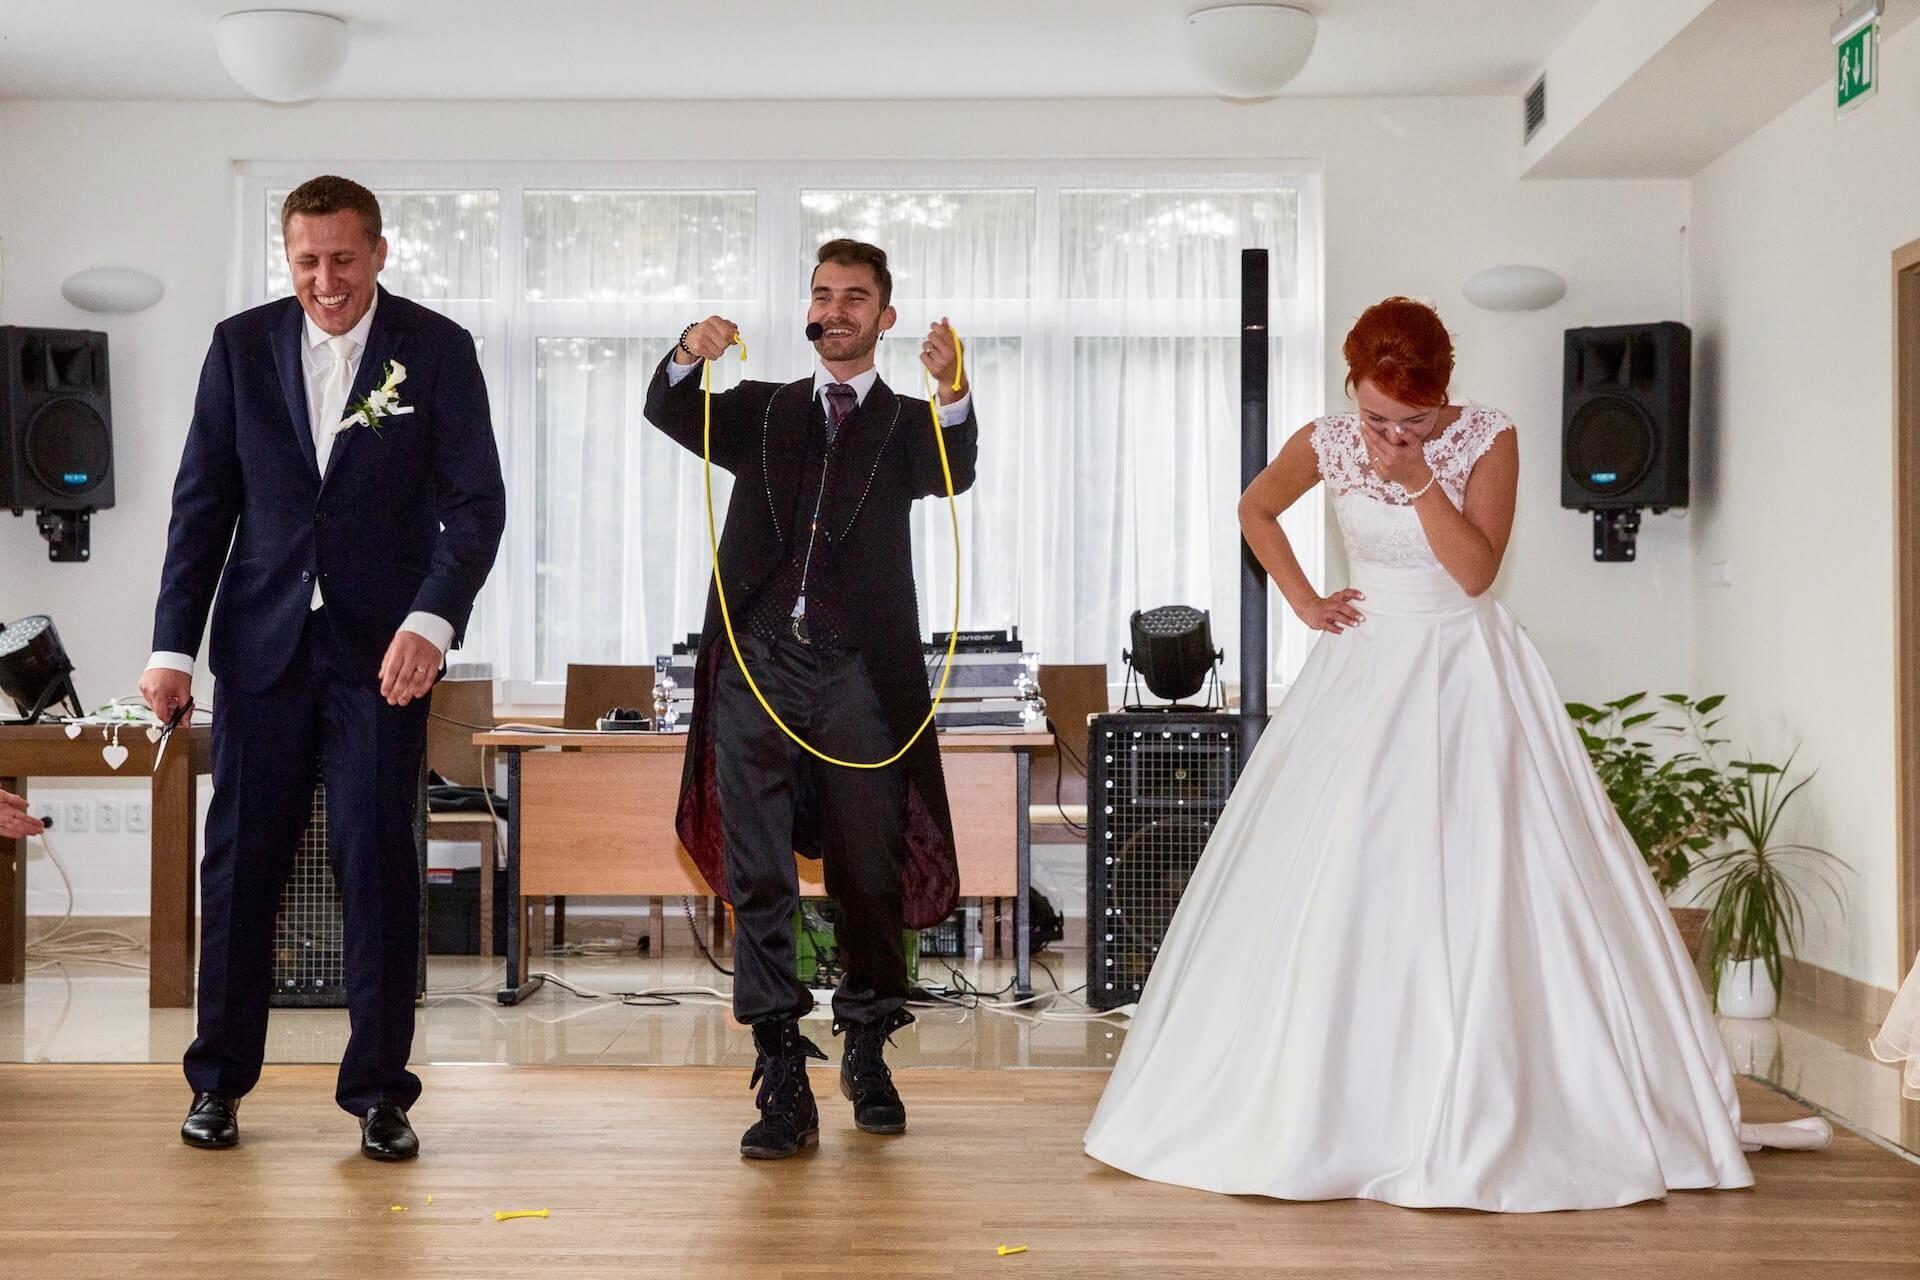 Kouzelník Martin Kellman - kouzlo s novomanželi